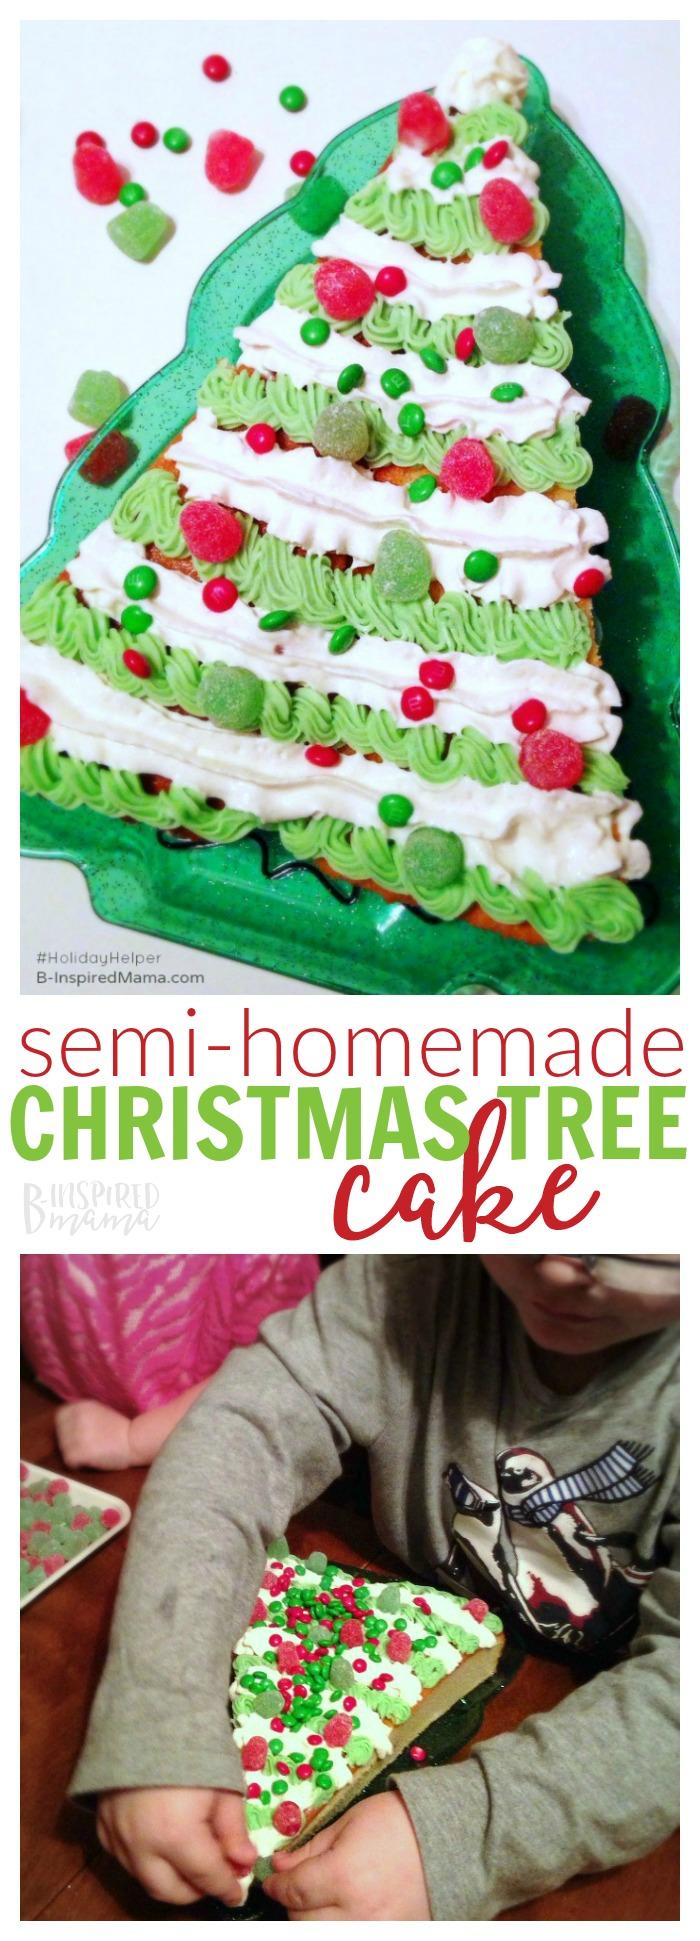 SemiHomemade Christmas Tree Shaped Christmas Cake Recipe